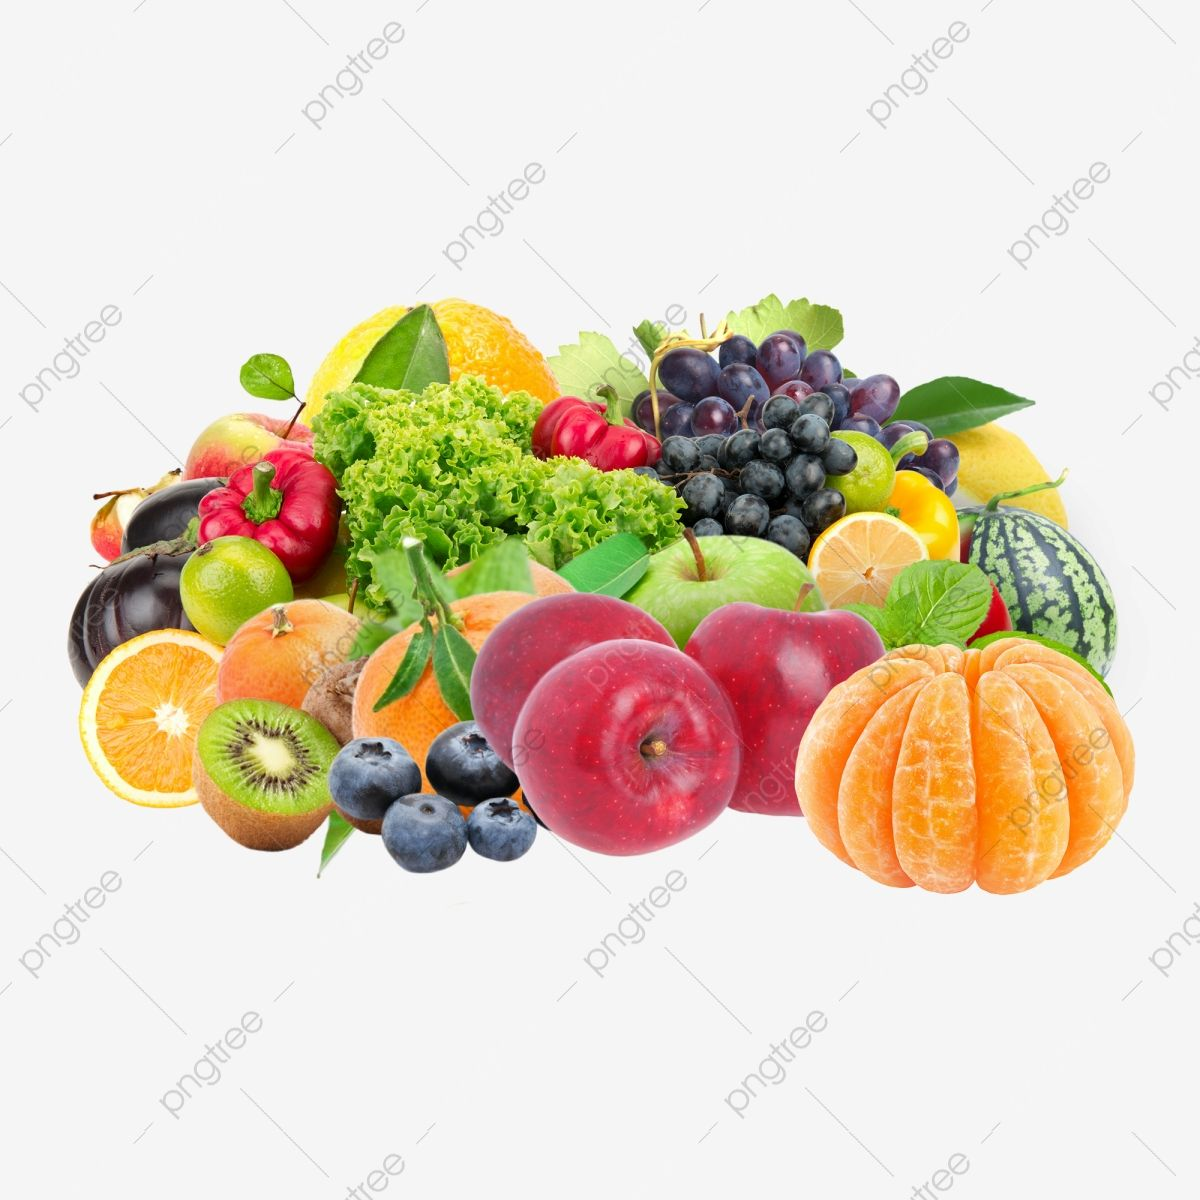 Group Of Fruit And Vegetables Nutrition Food Health Fruit Png Transparent Clipart Image And Psd File For Free Download Fruit Vegetable Nutrition Vegetables